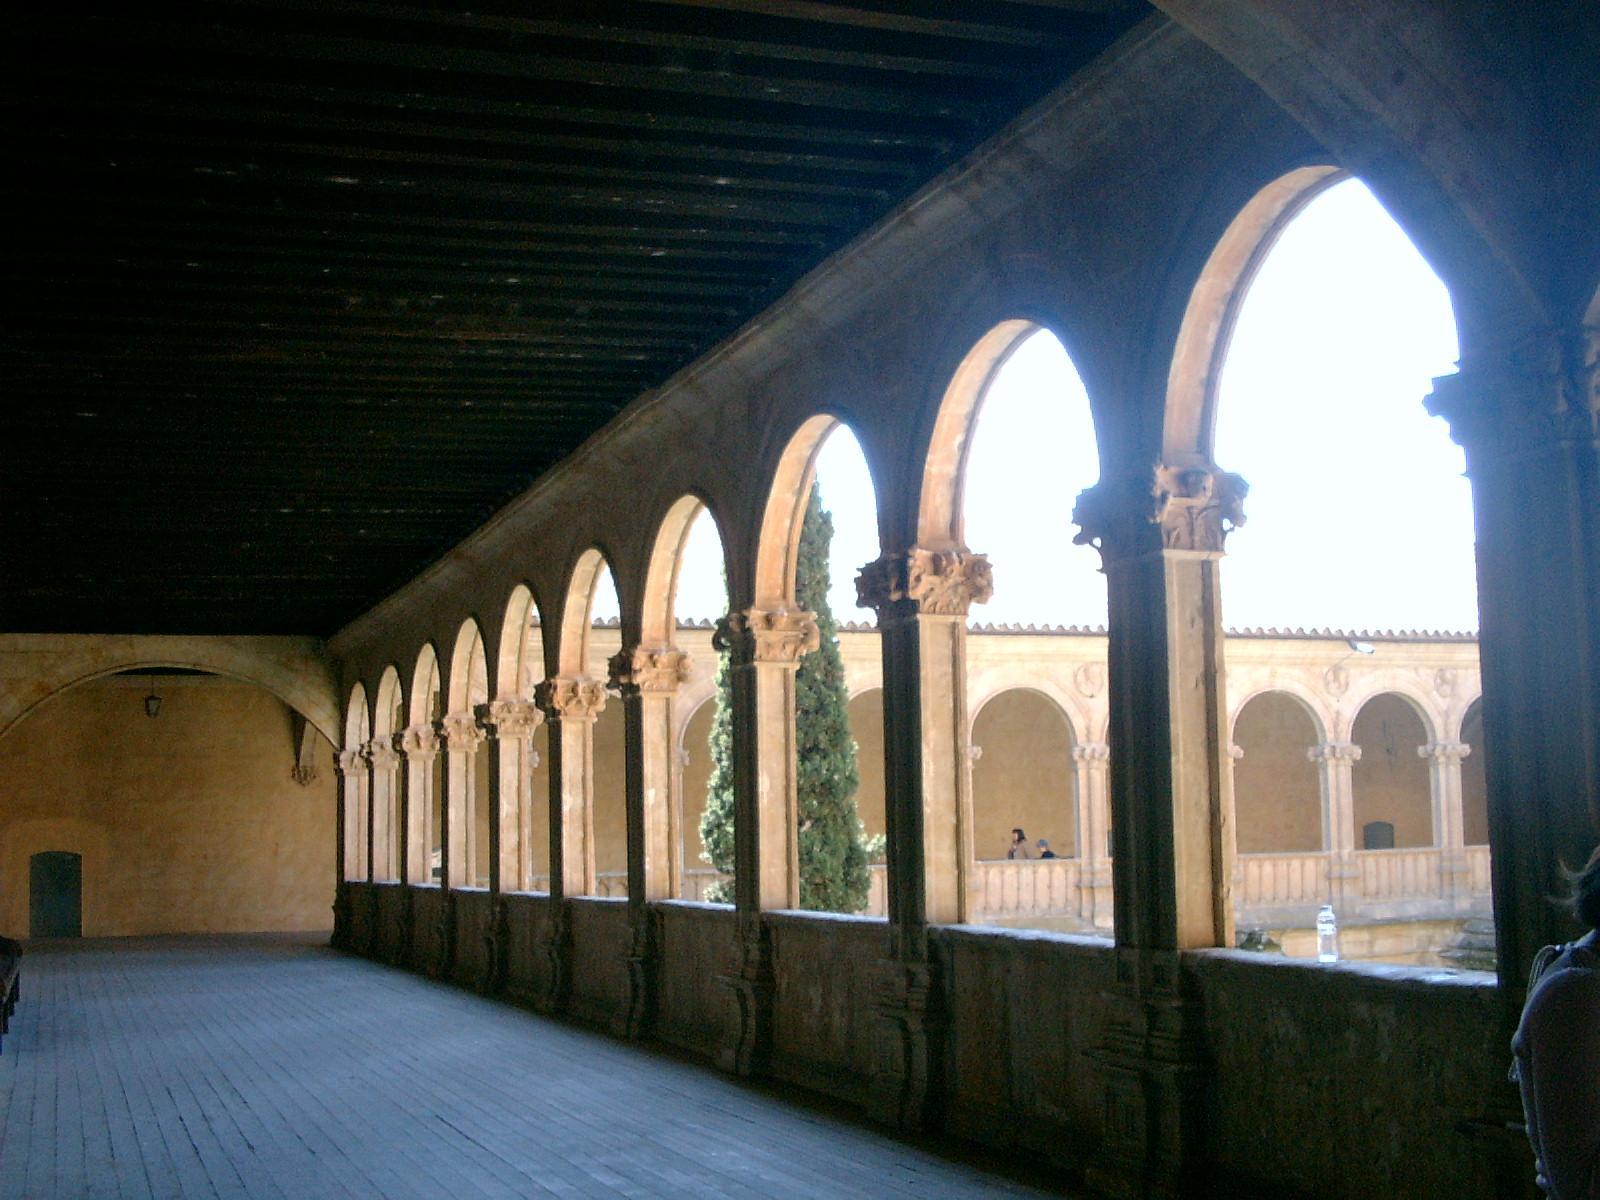 spain arches 1